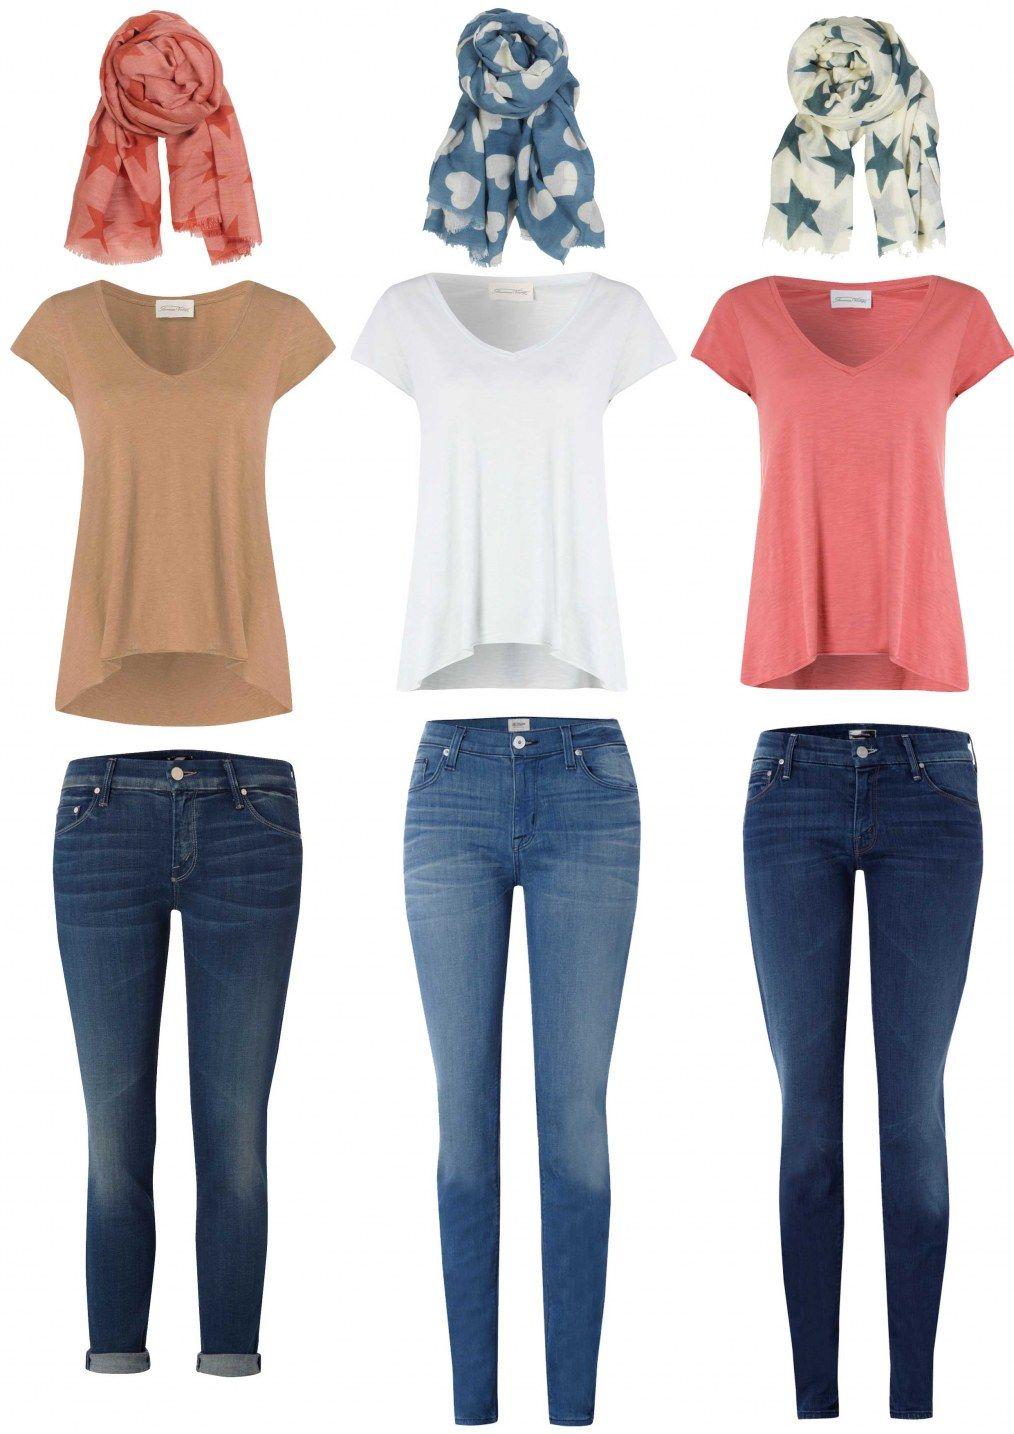 niebla Planta consultor  Simple, chic outfit ideas. Denim, American Vintage and Becksondergaard. |  ファッション, 服, 搭配